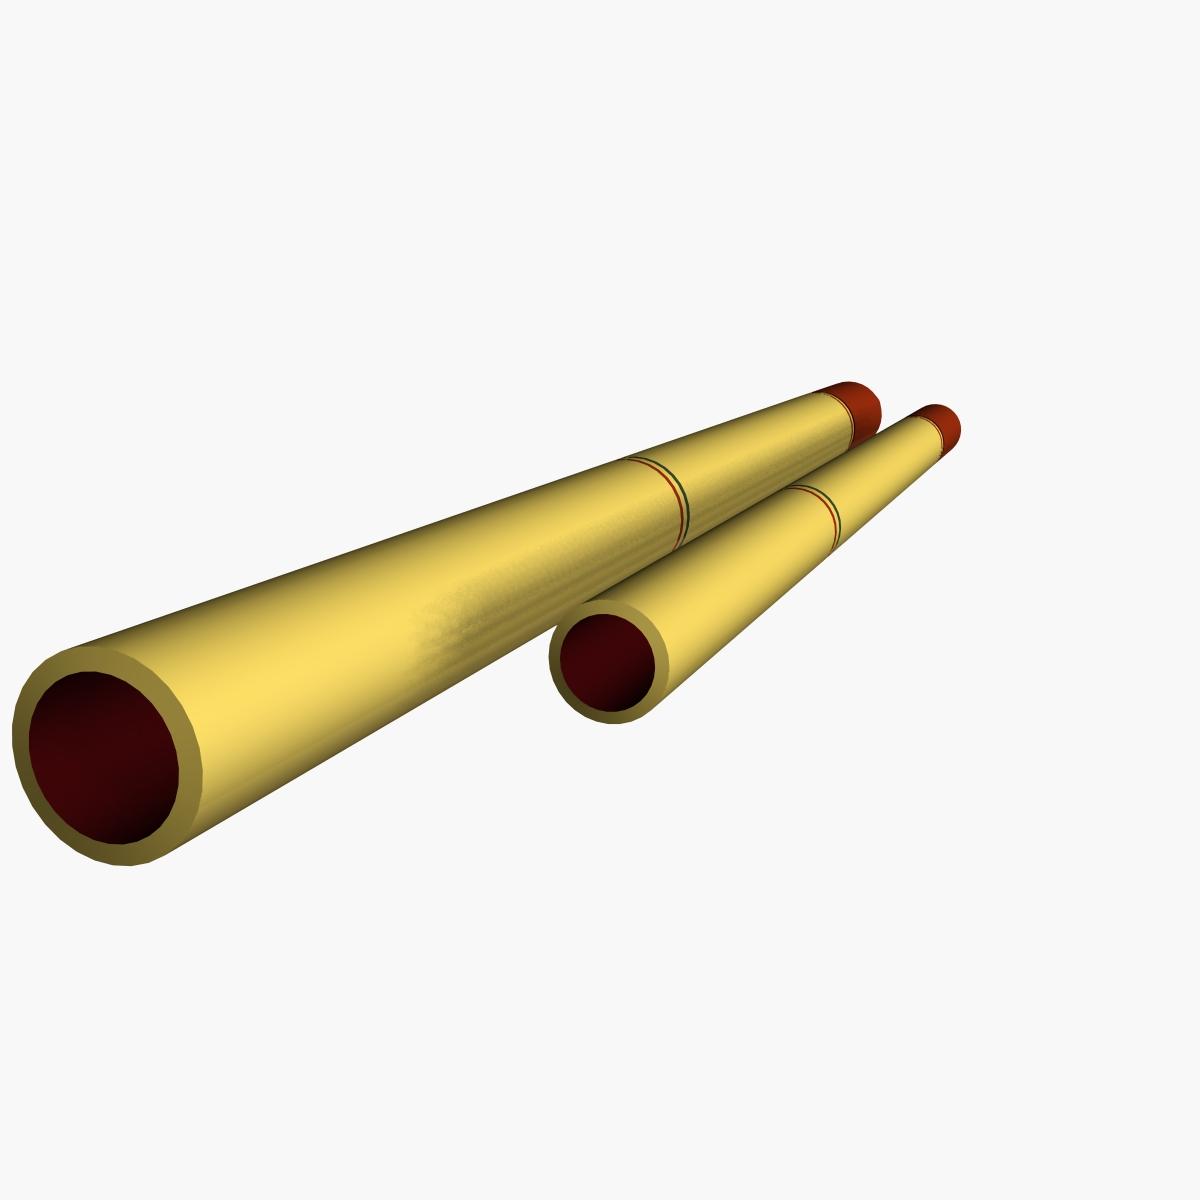 fadjr-3 & fadjr-5 rocket 3d model 3ds dxf fbx blend cob dae x  obj 205483